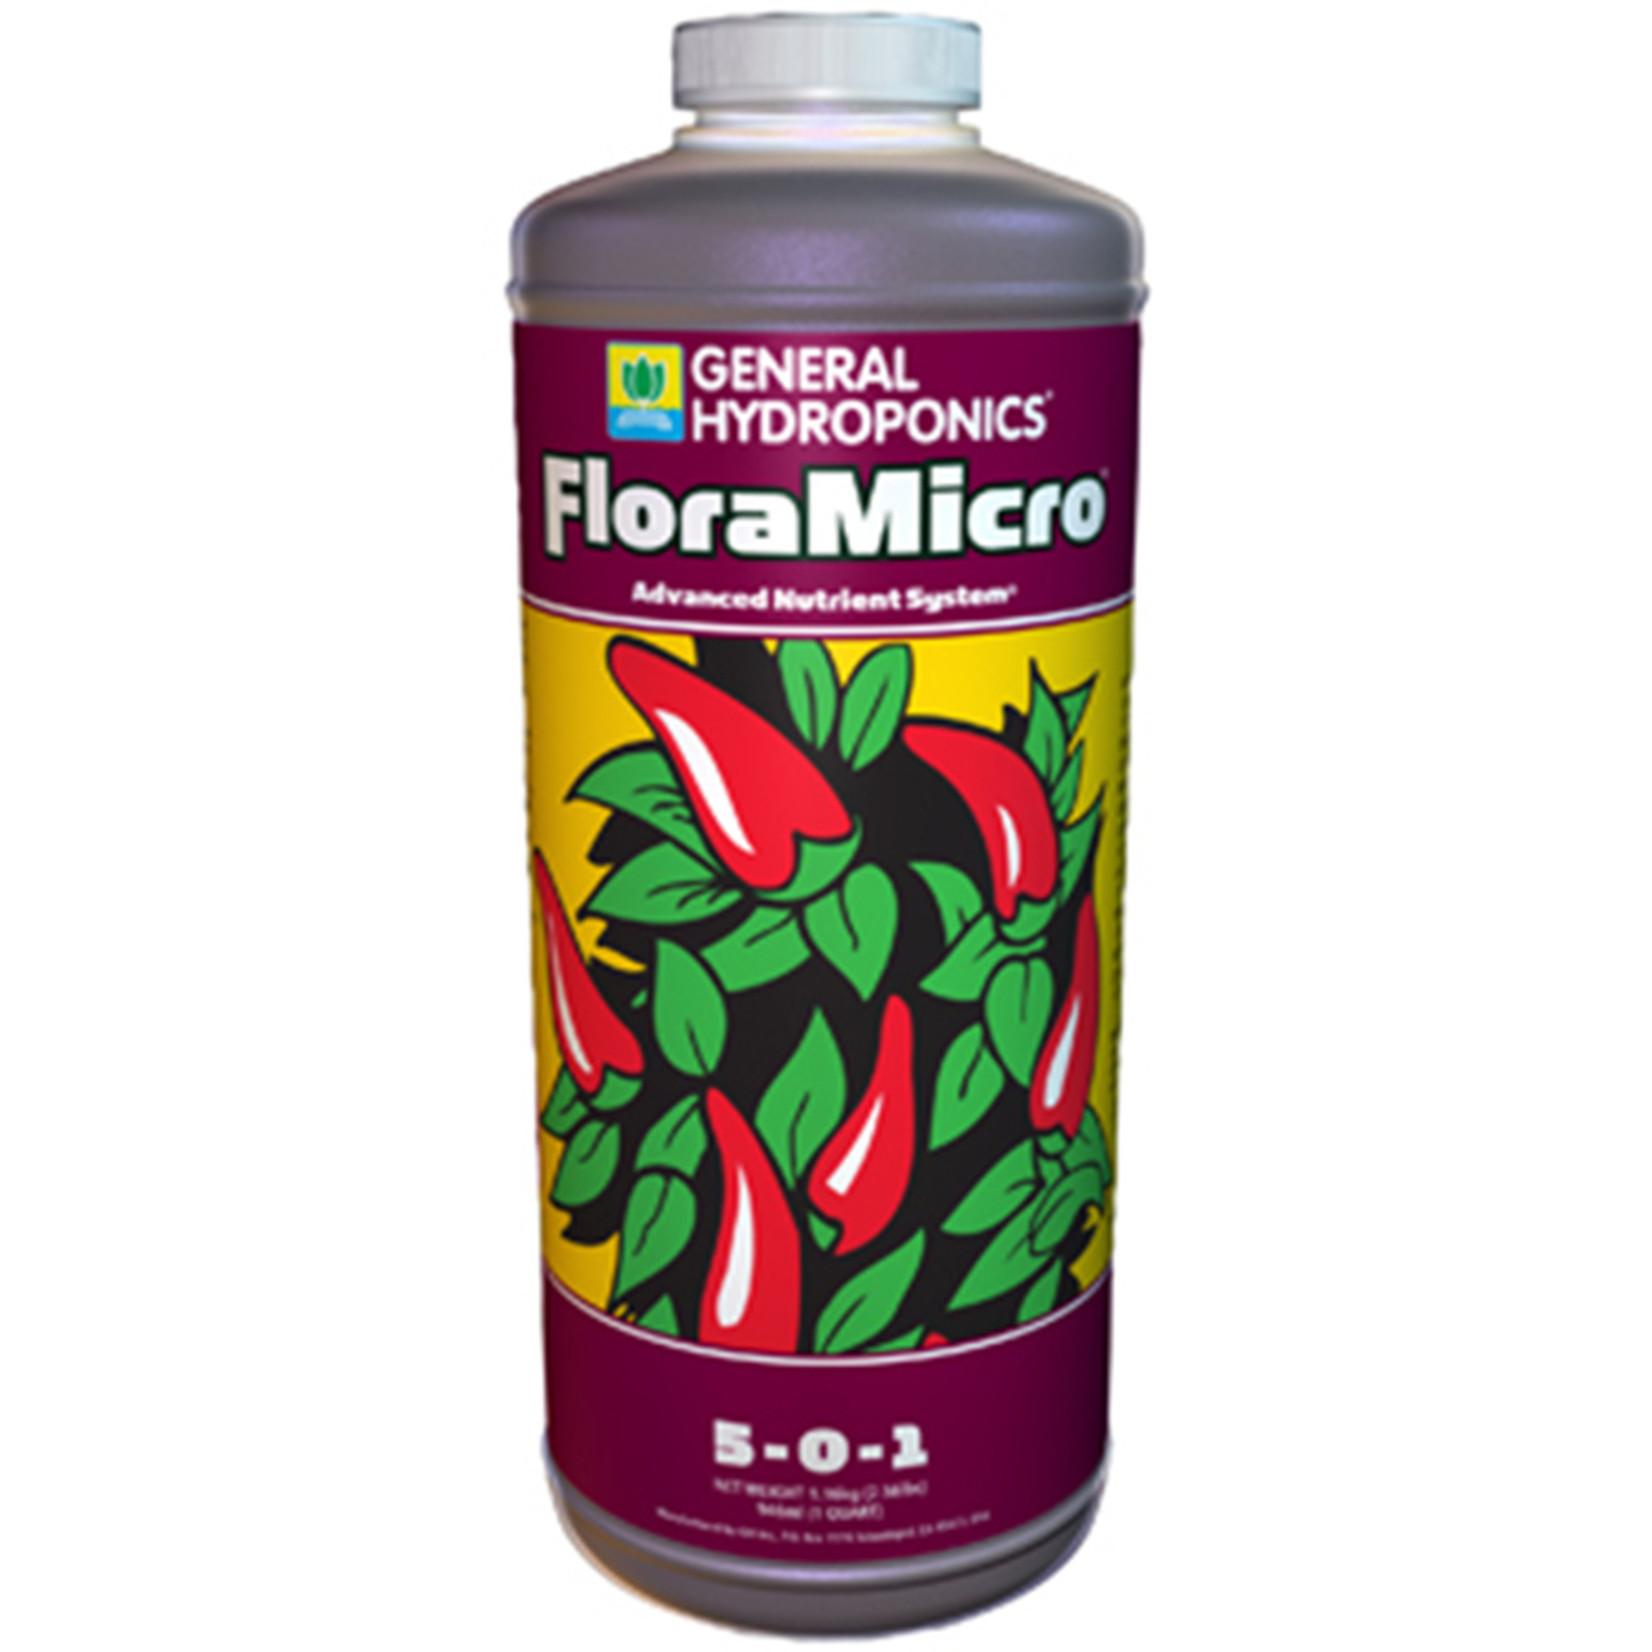 General Hydroponics GH FLORAMICRO